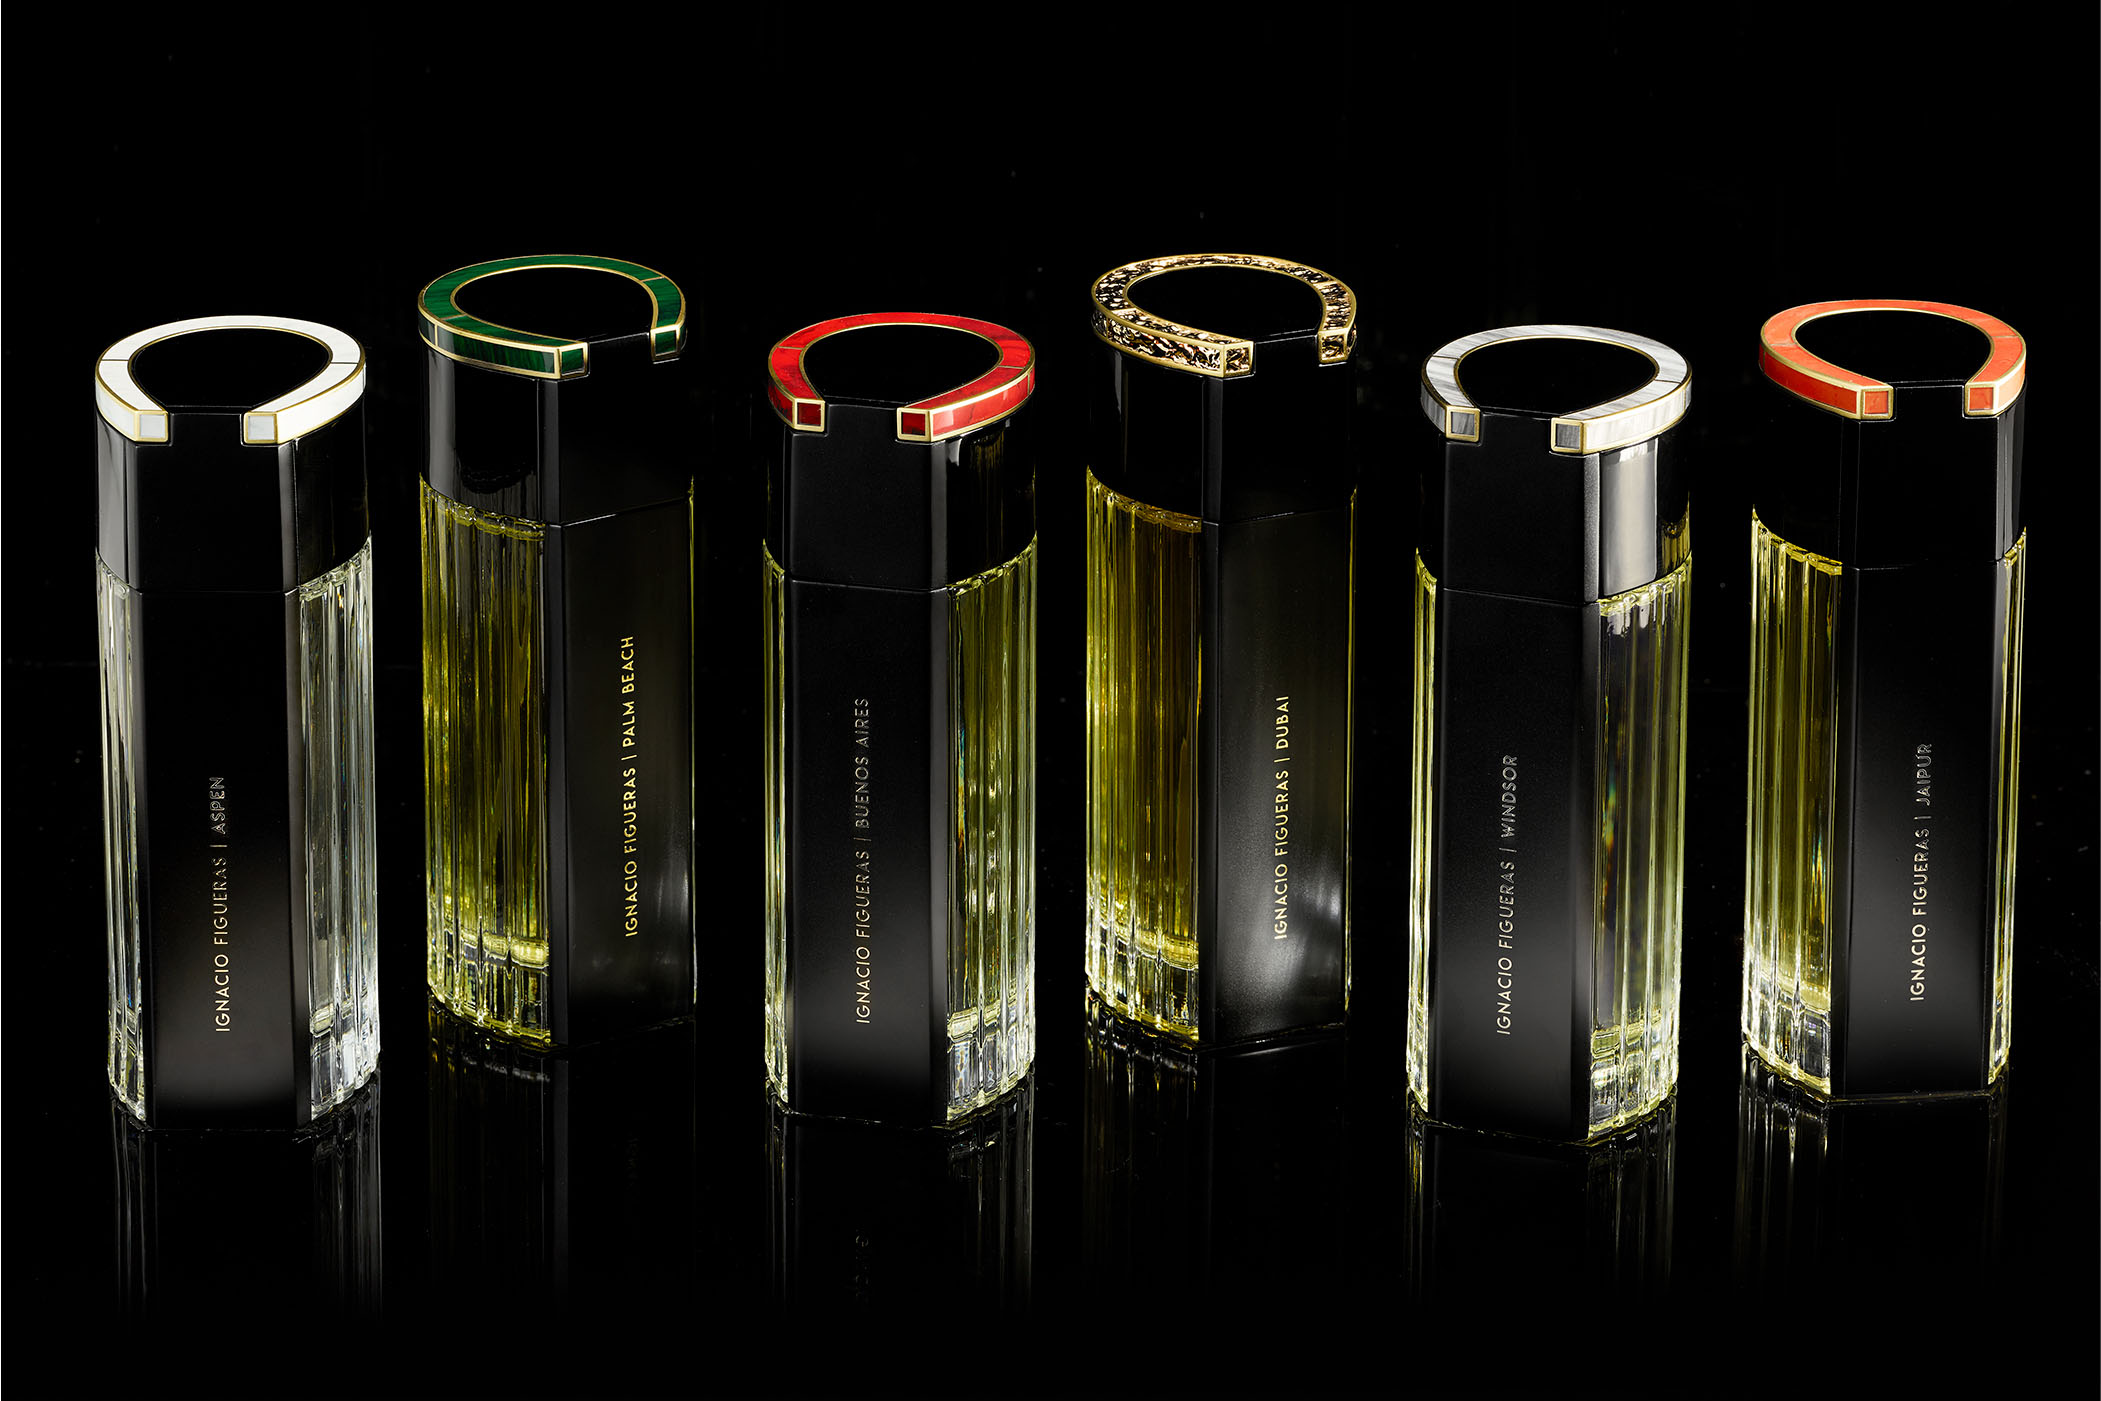 The Ignacio Figueras Fragrance Collection